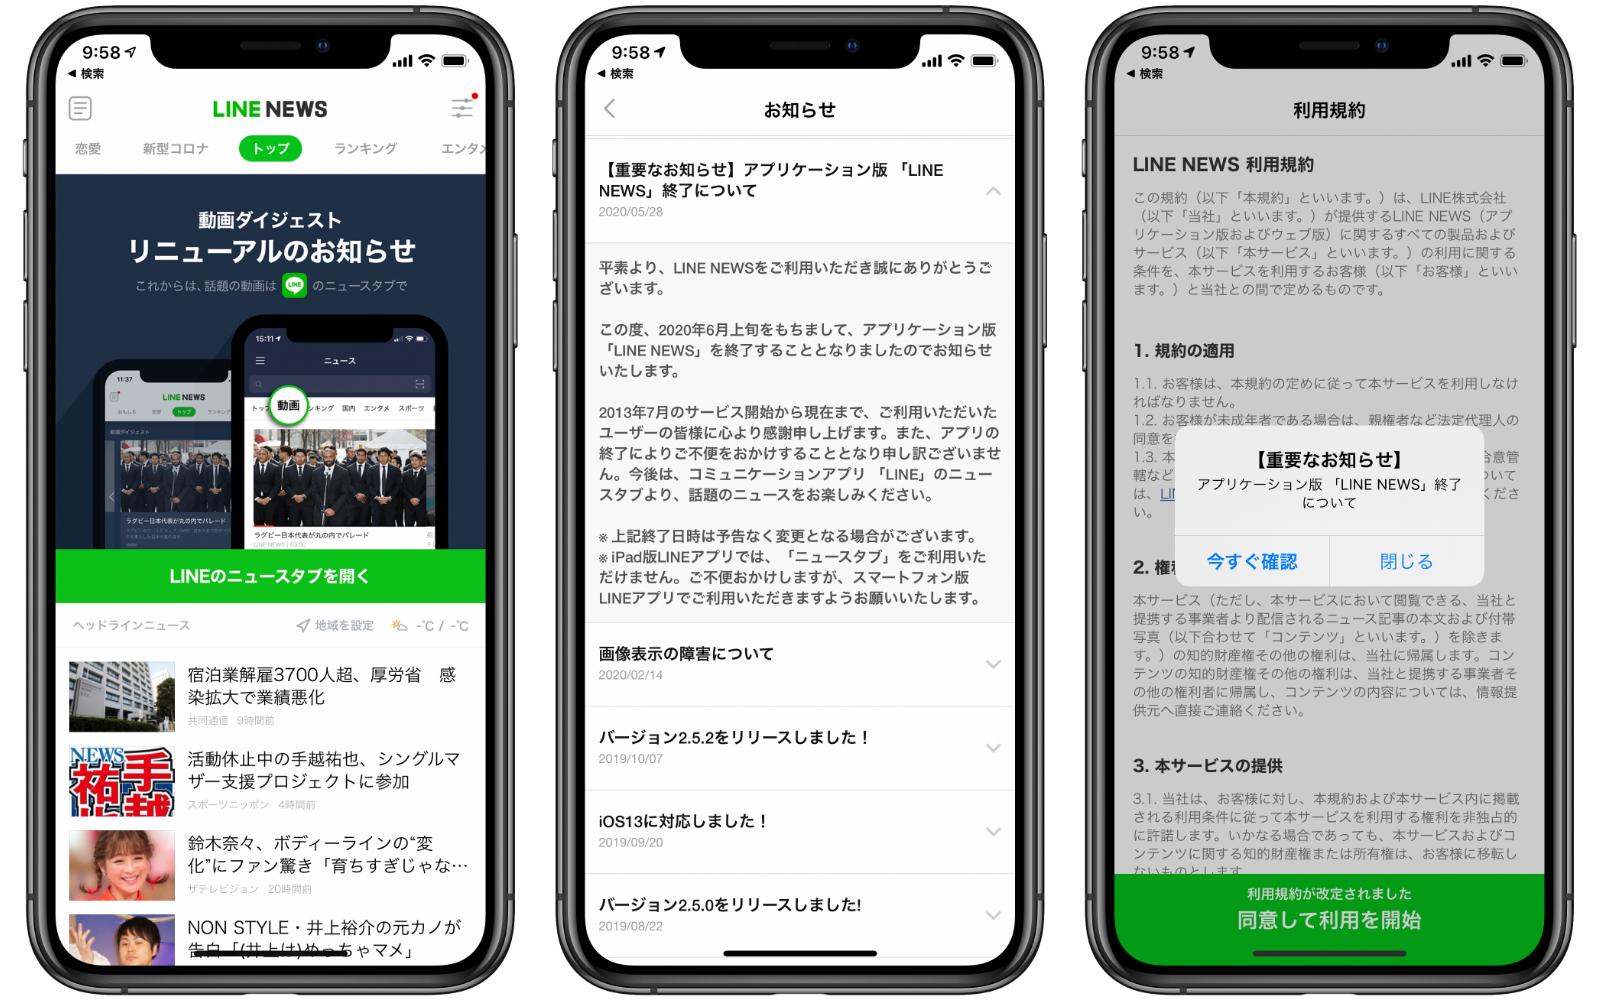 LINE News App is ending